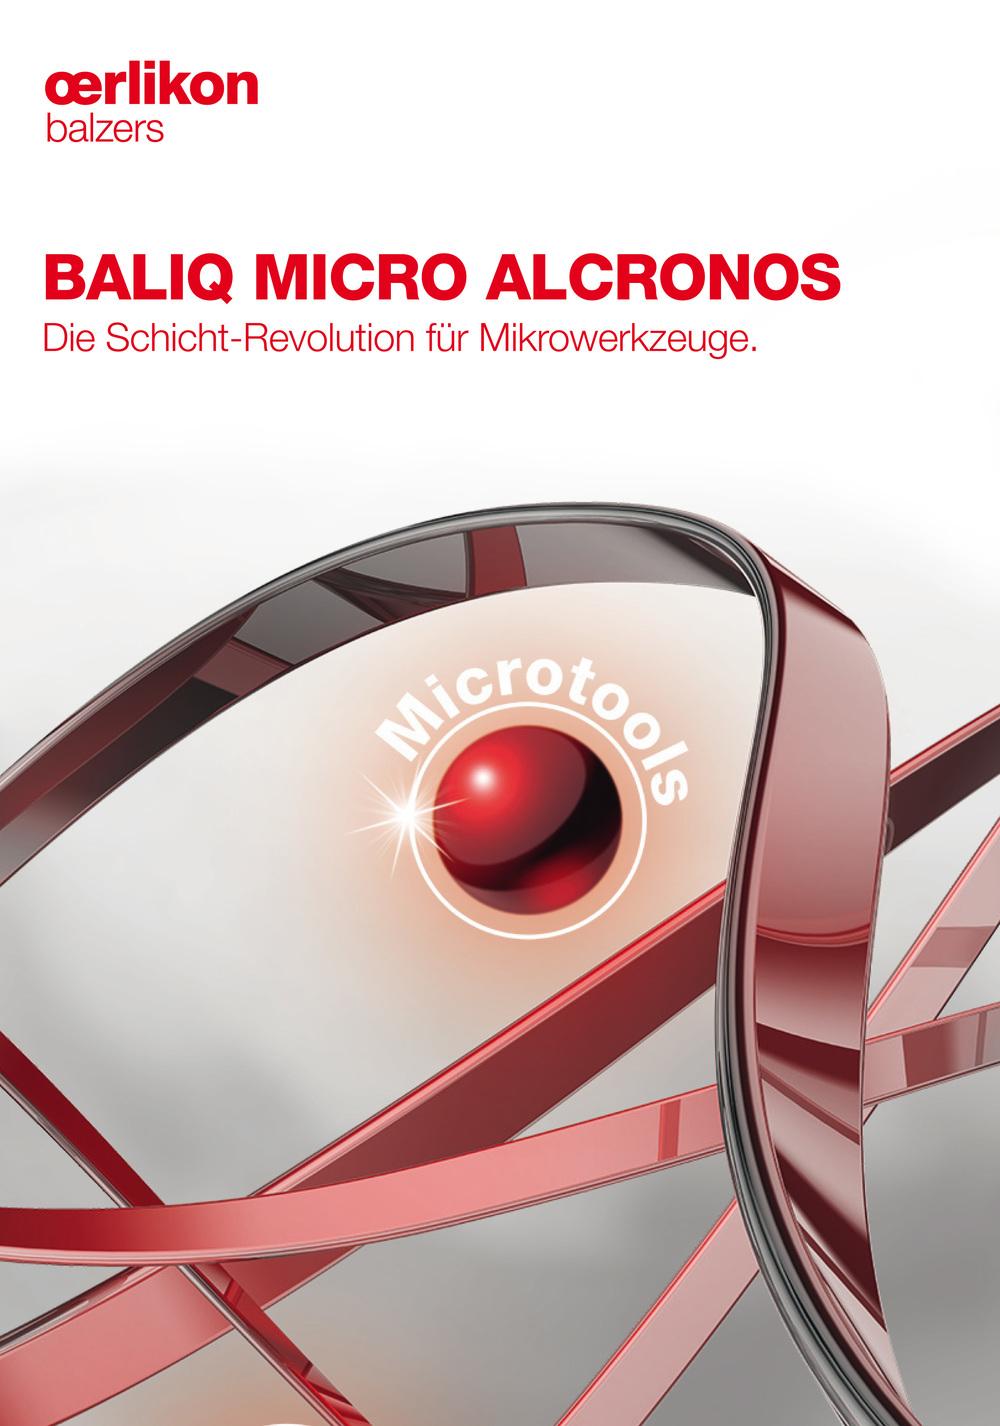 Broschüre Oerlikon Balzers - BALIQ Micro Alcronos 1